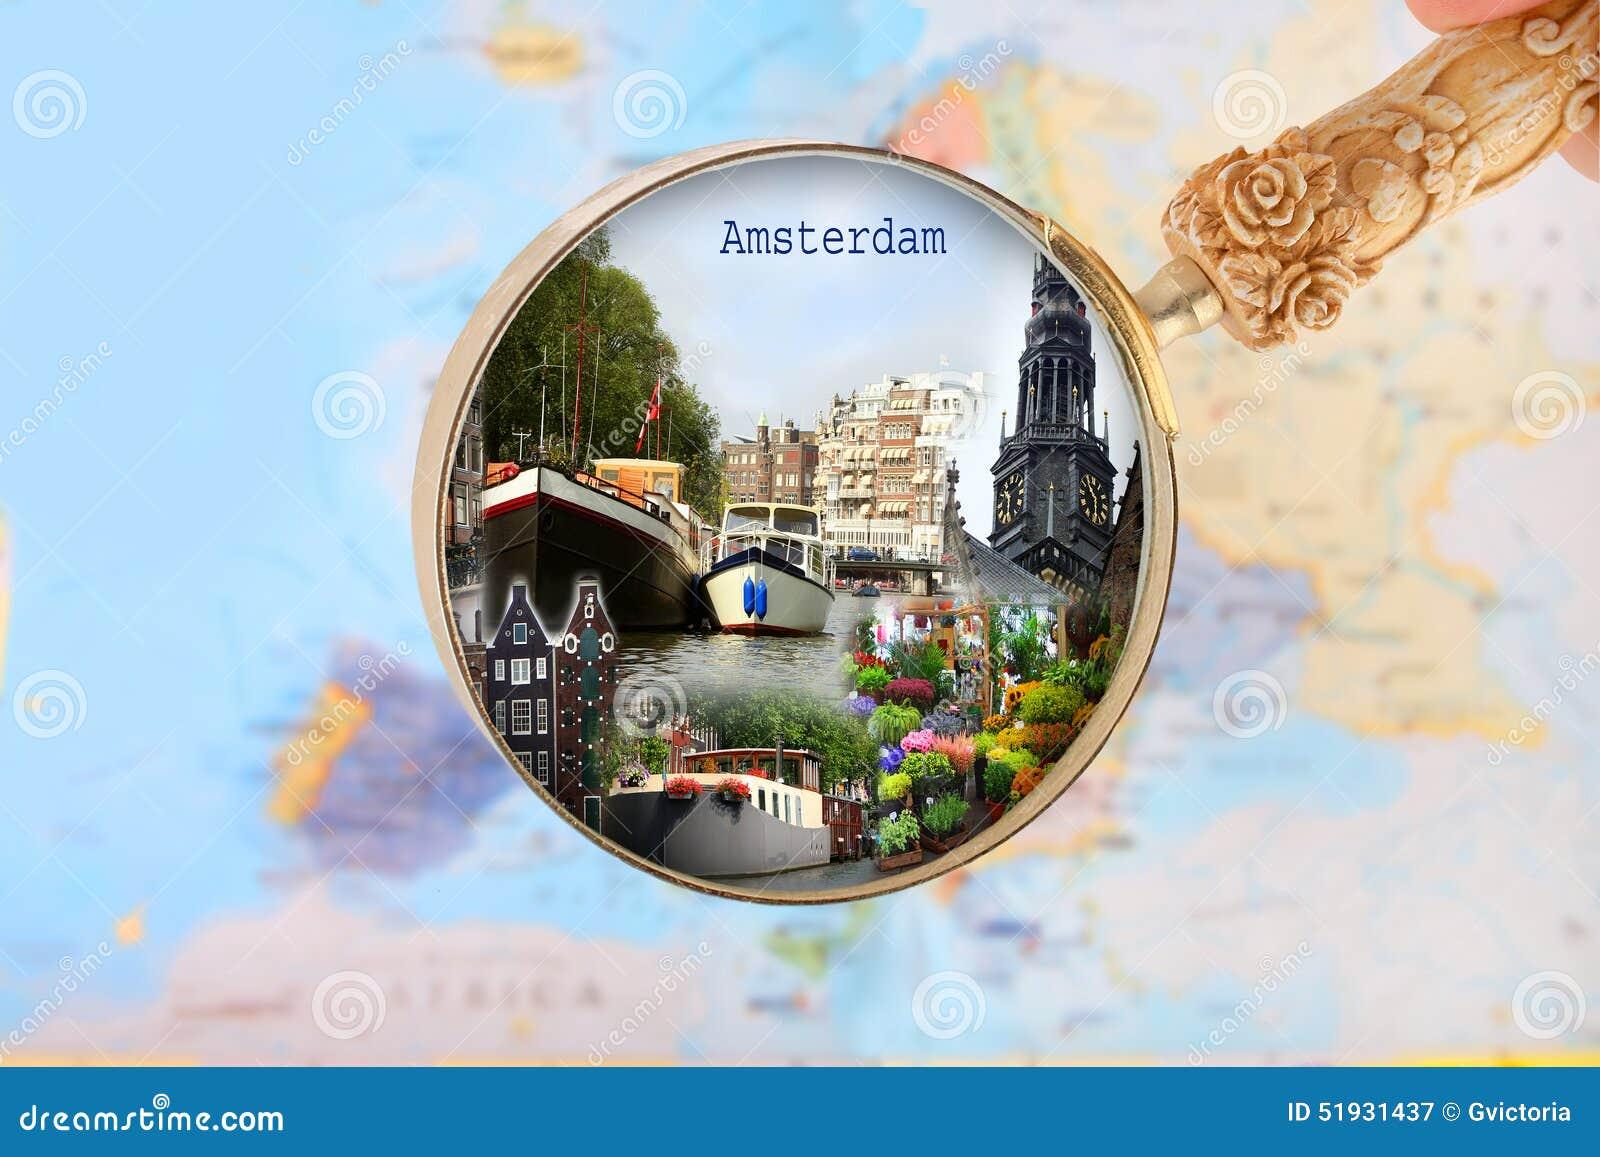 Carte De Leurope Avec La Hollande.Regardant Dedans Sur Amsterdam Hollande Image Stock Image Du